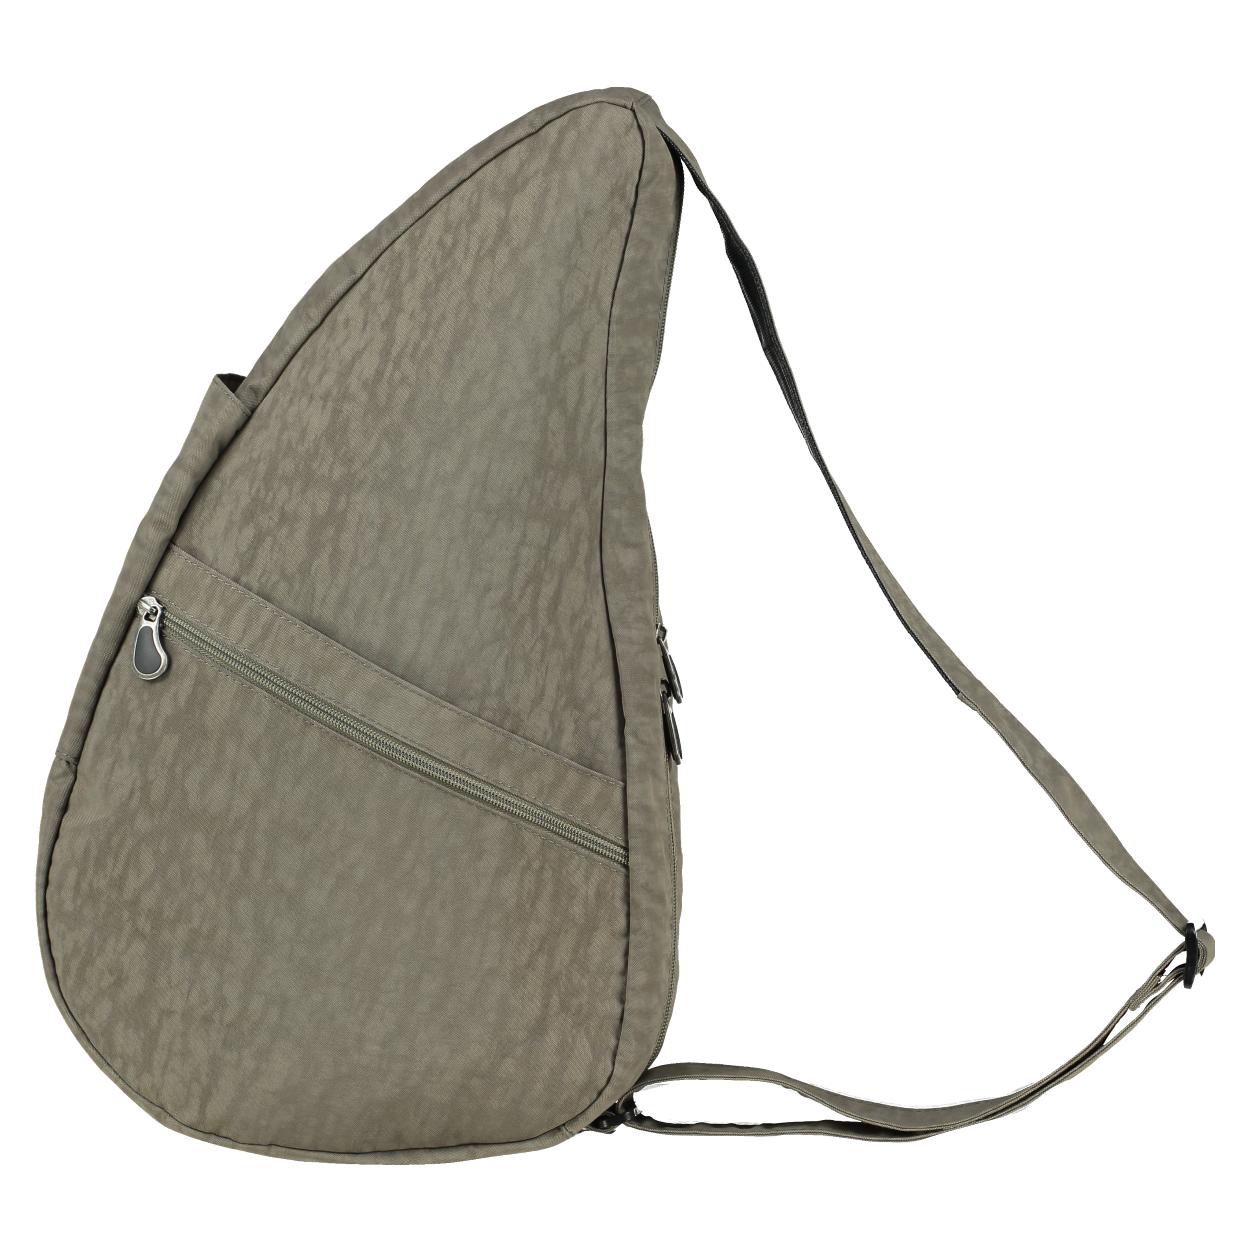 Healthy Back Bag 6304 Textured Nylon Truffle M